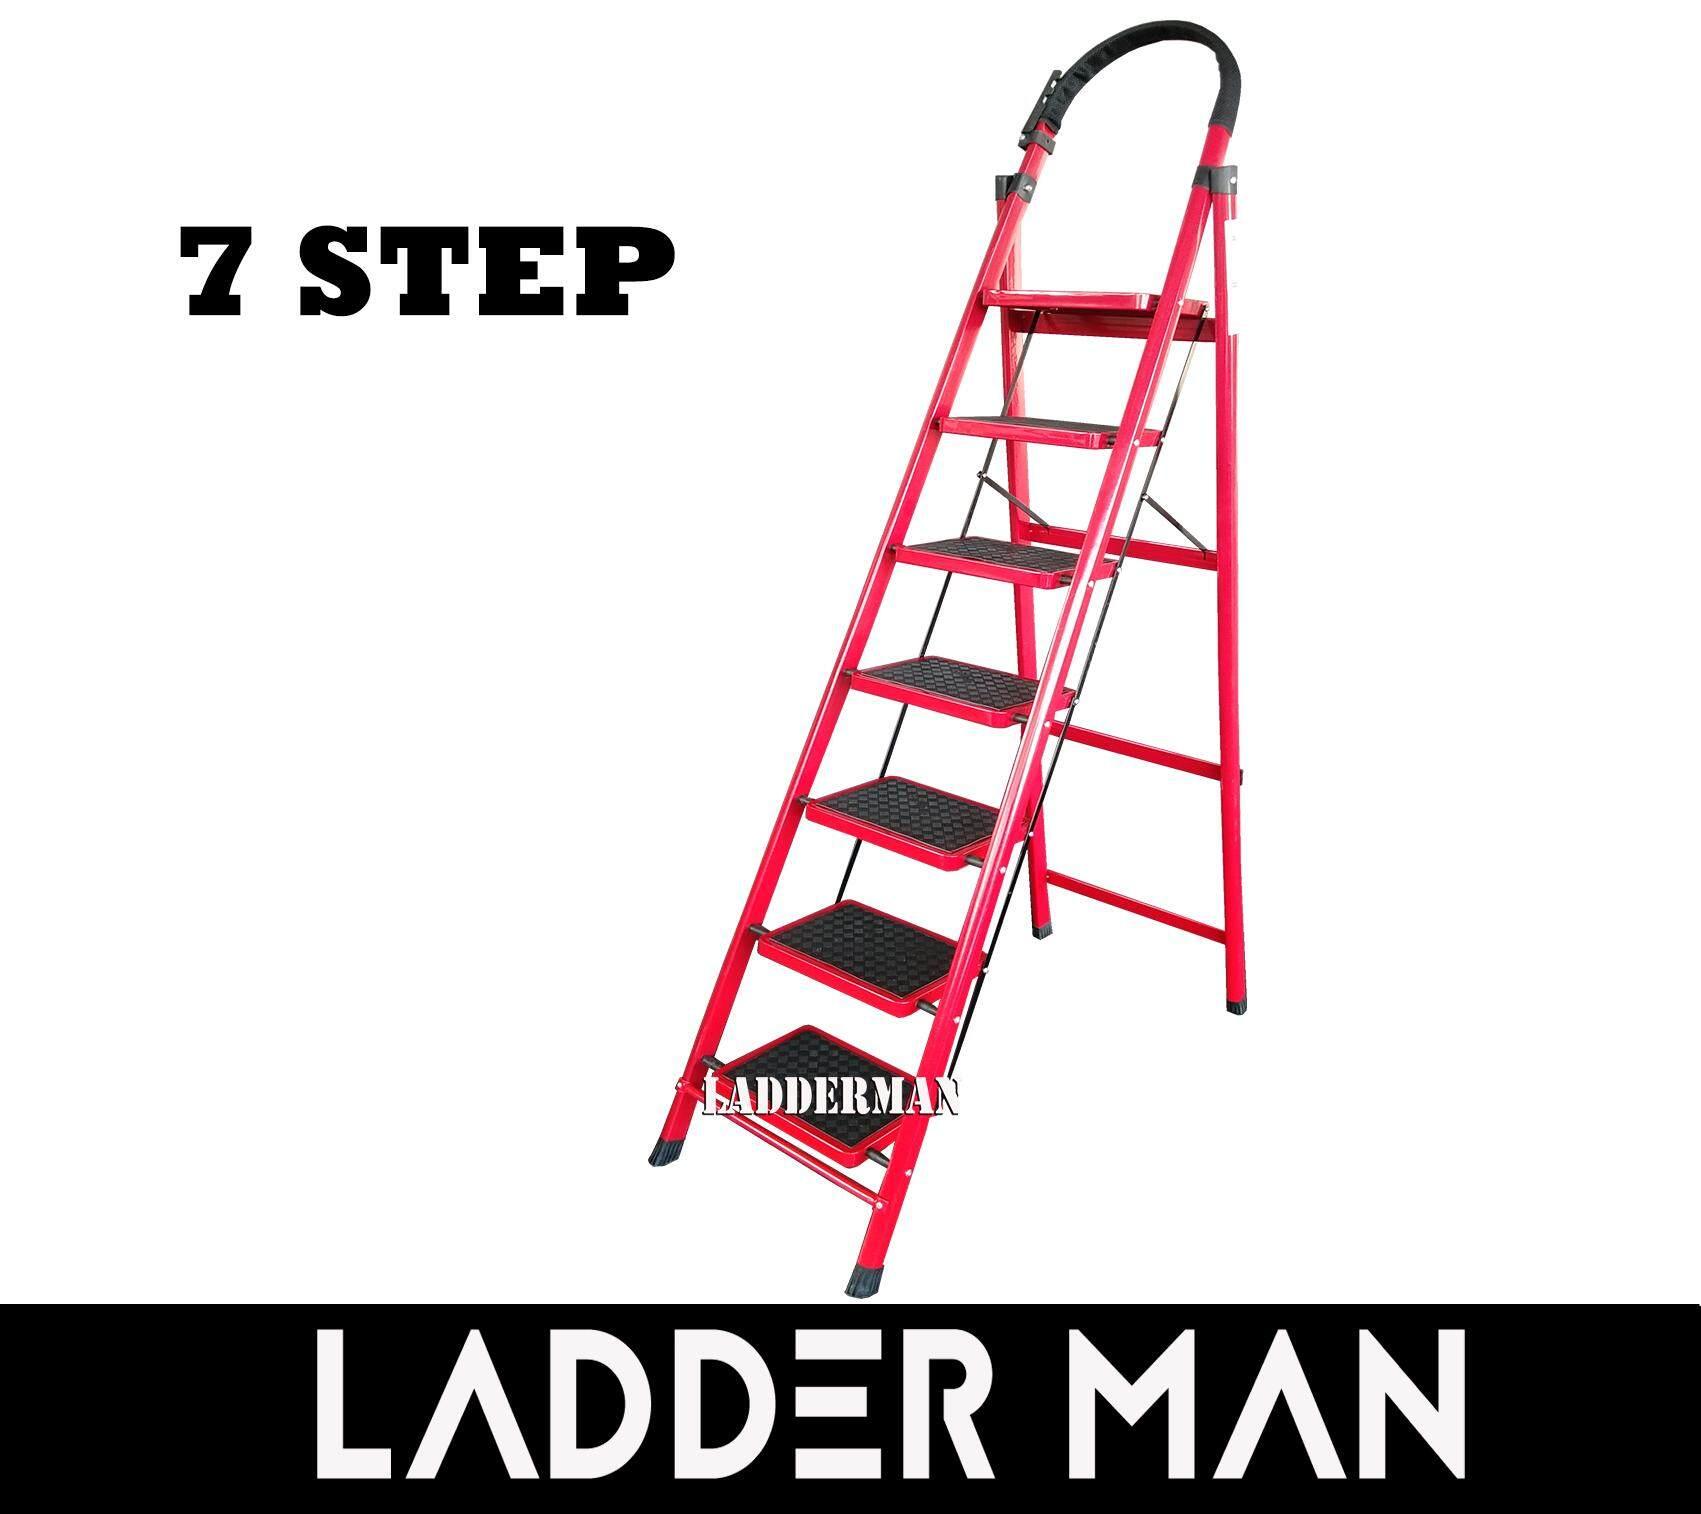 7 Step Medium Duty Foldable Steel Ladder With Hand Grip (Tangga Aluminium)